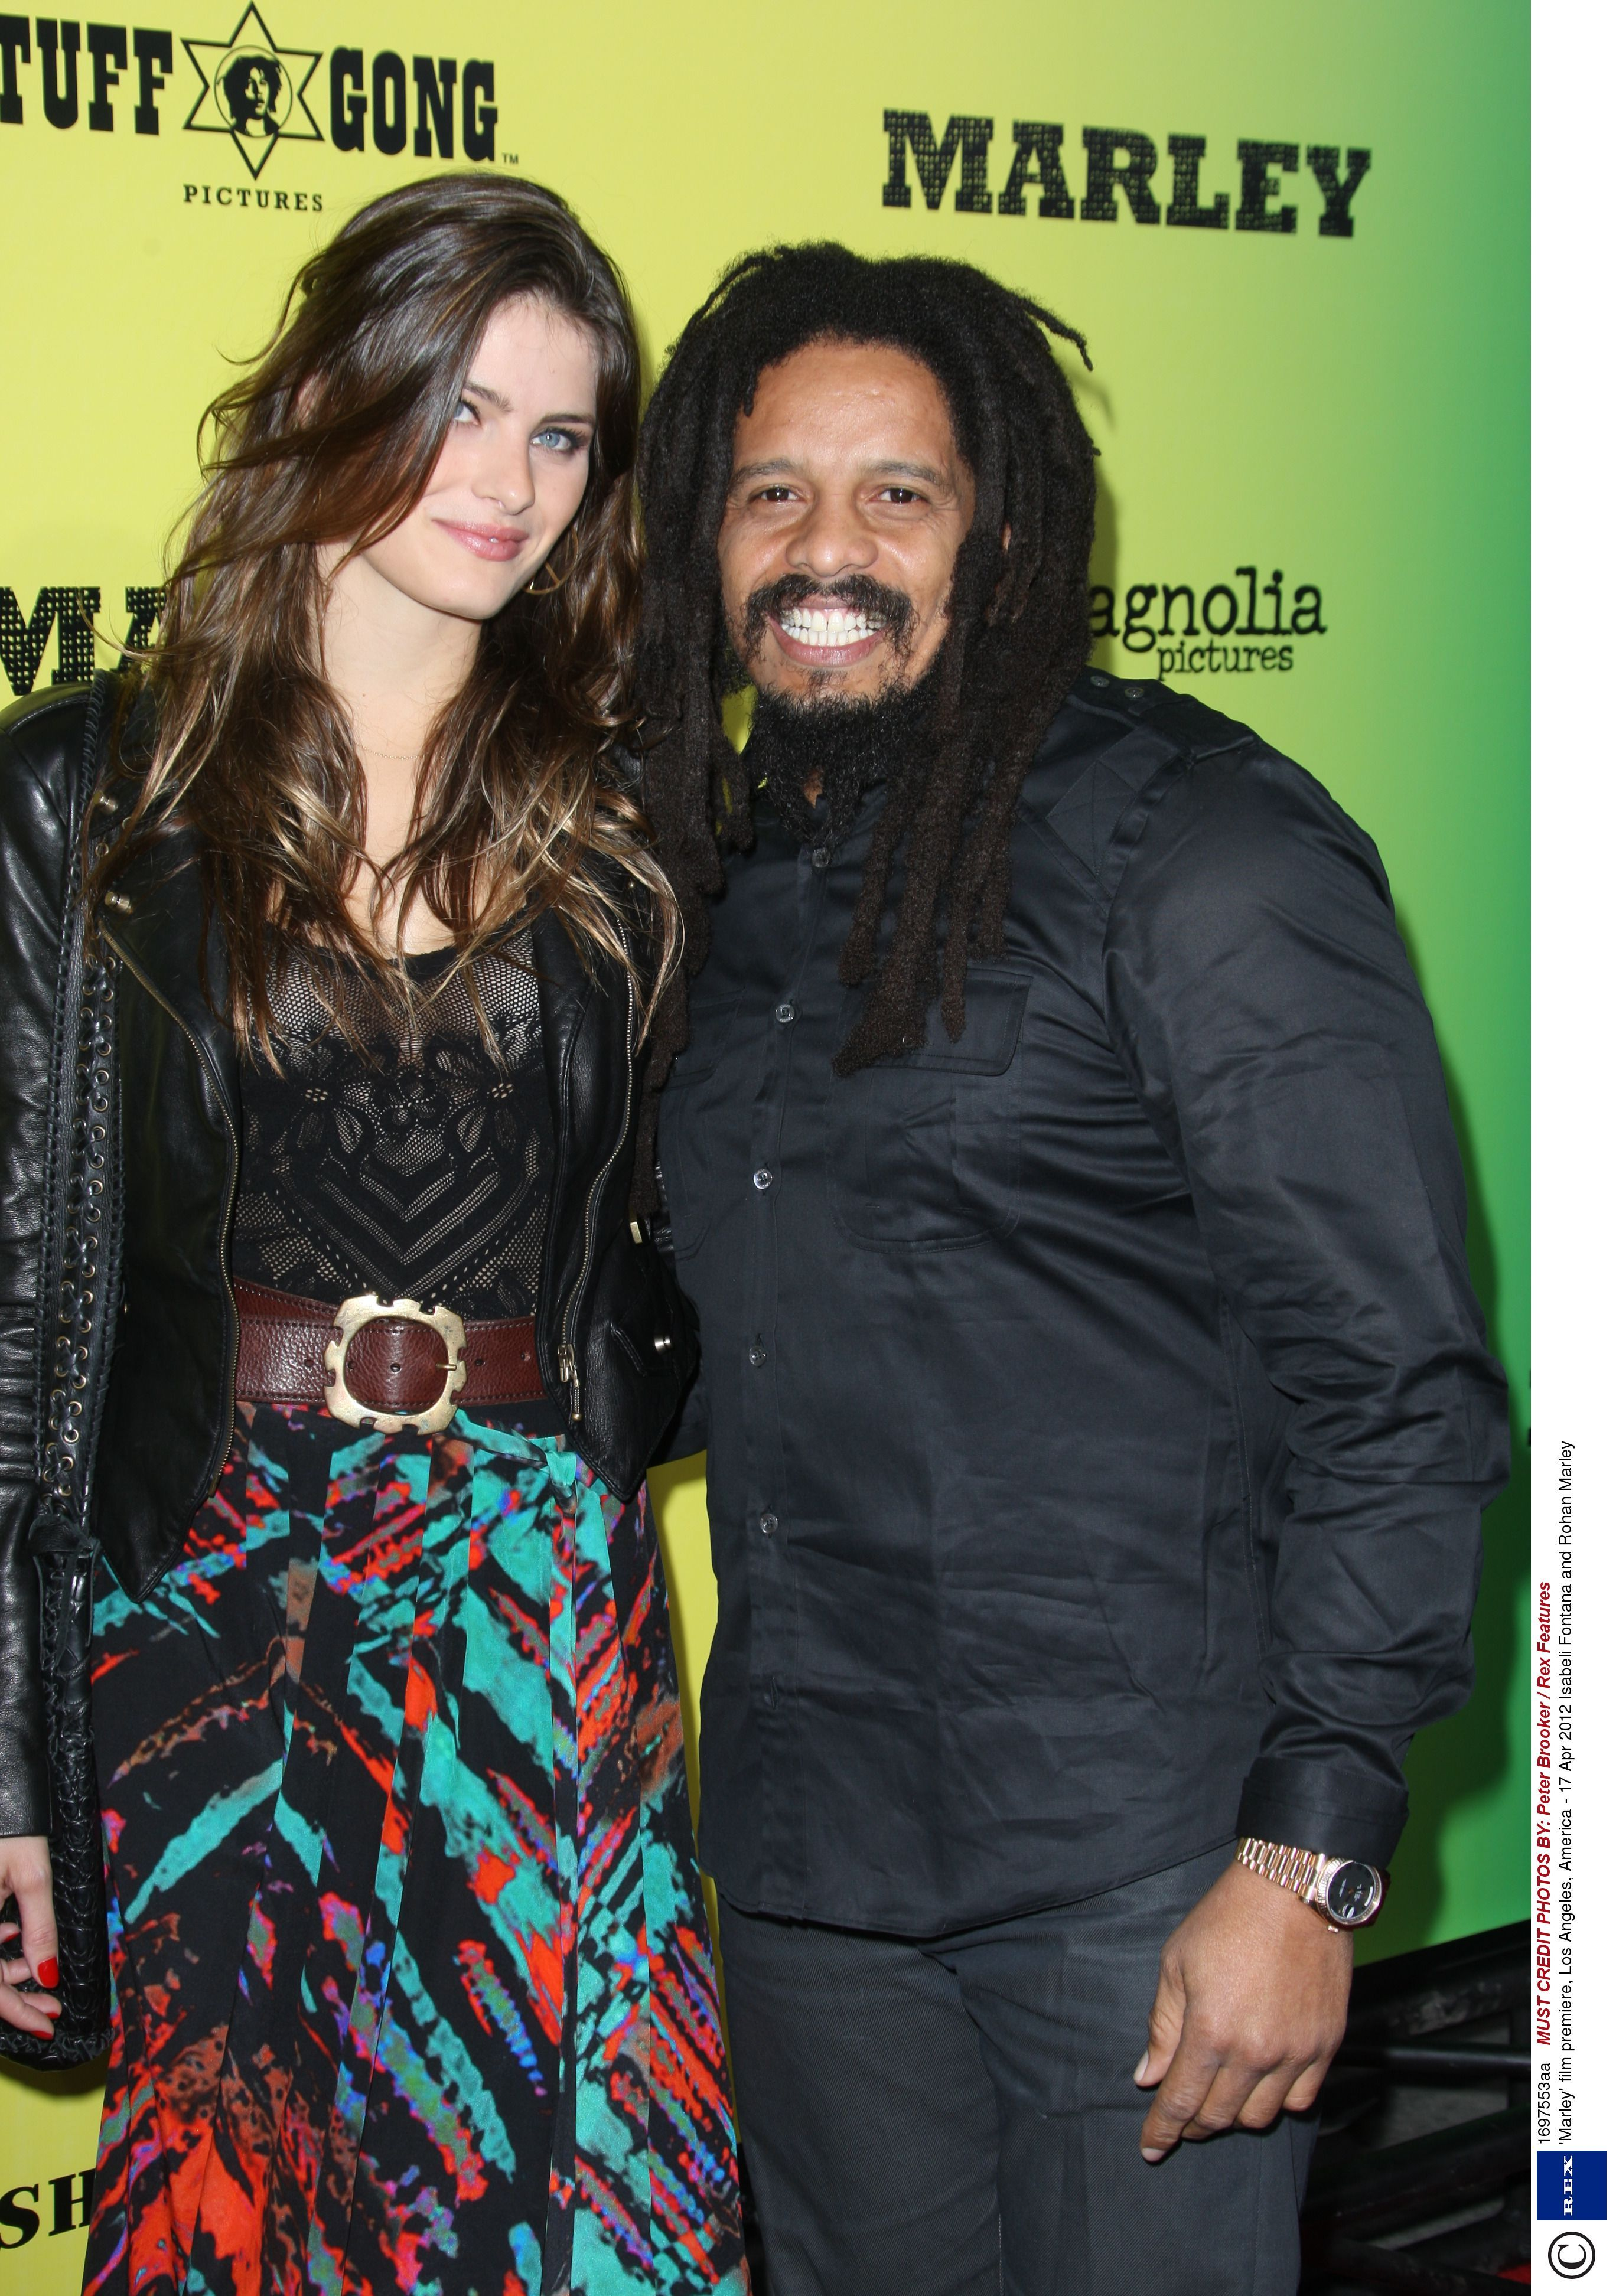 9bfe2e5925c6c Rohan Marley engaged to supermodel girlfriend Isabeli Fontana